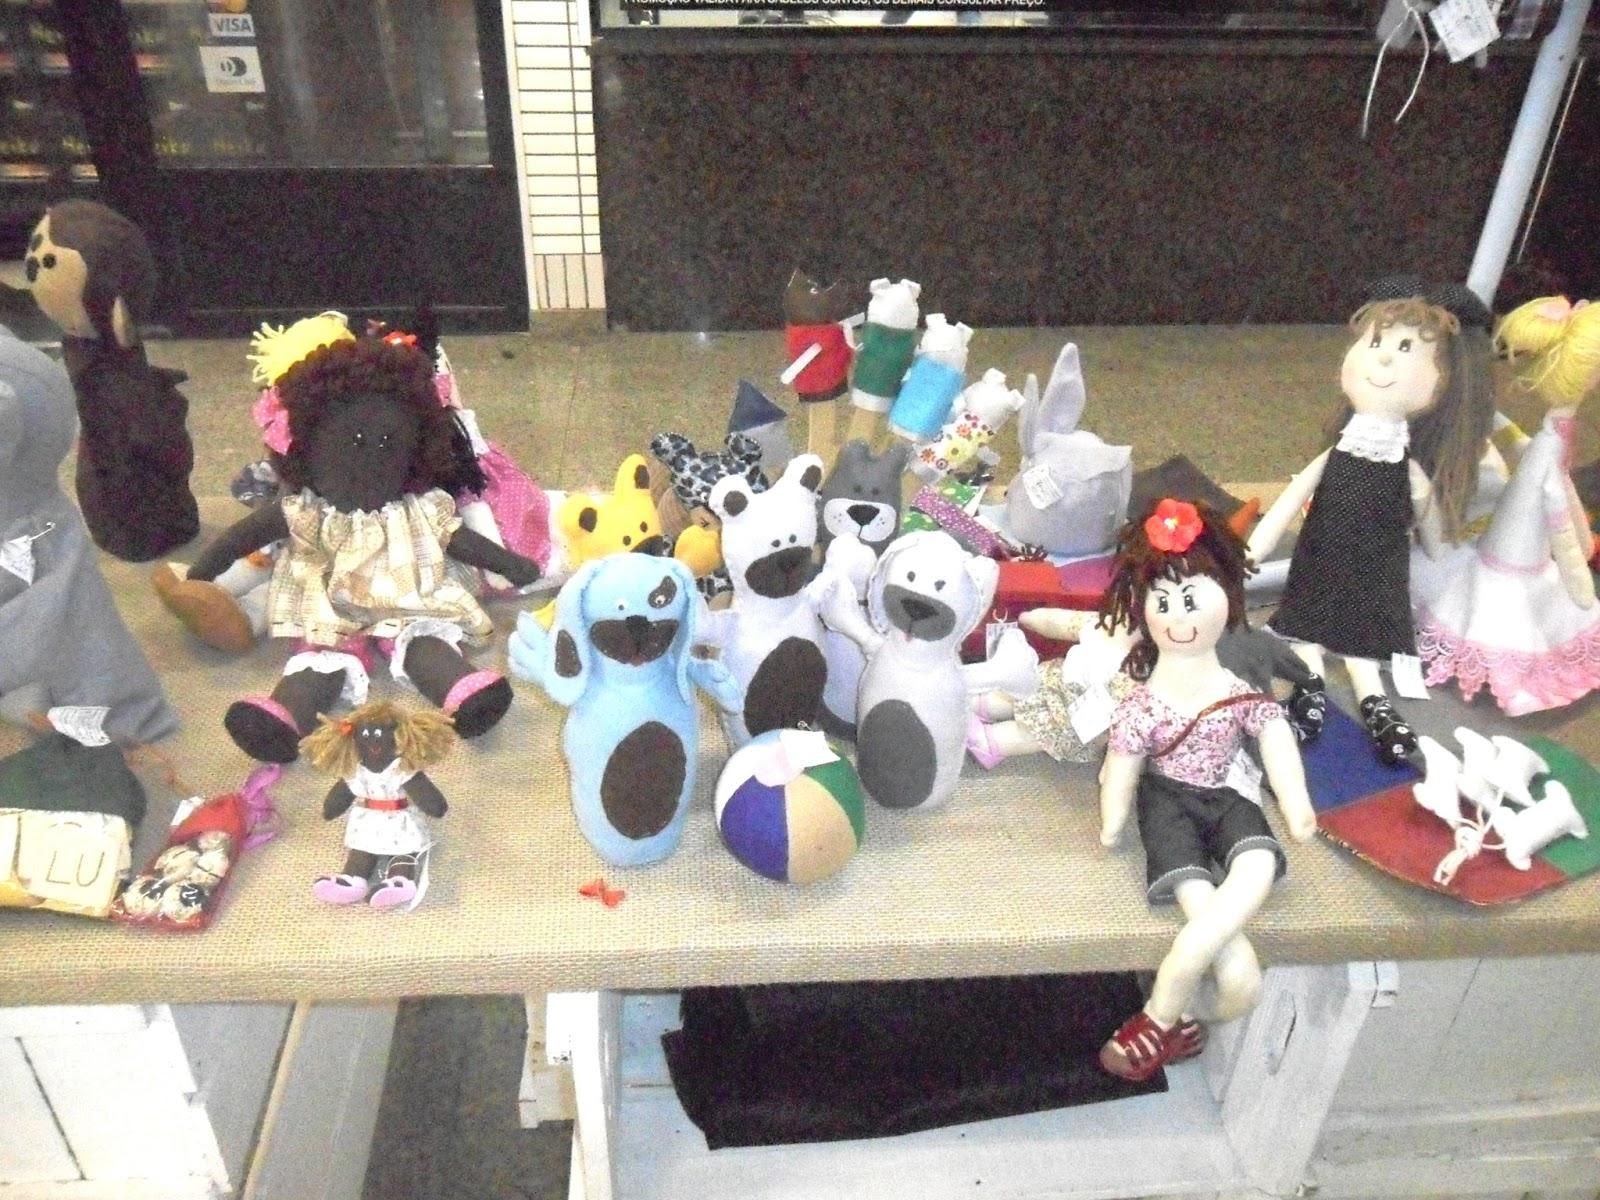 Adesivo Rivastigmina Bula ~ Grupo de Artesanato Primitiva Bonecas, brinquedos, jogos